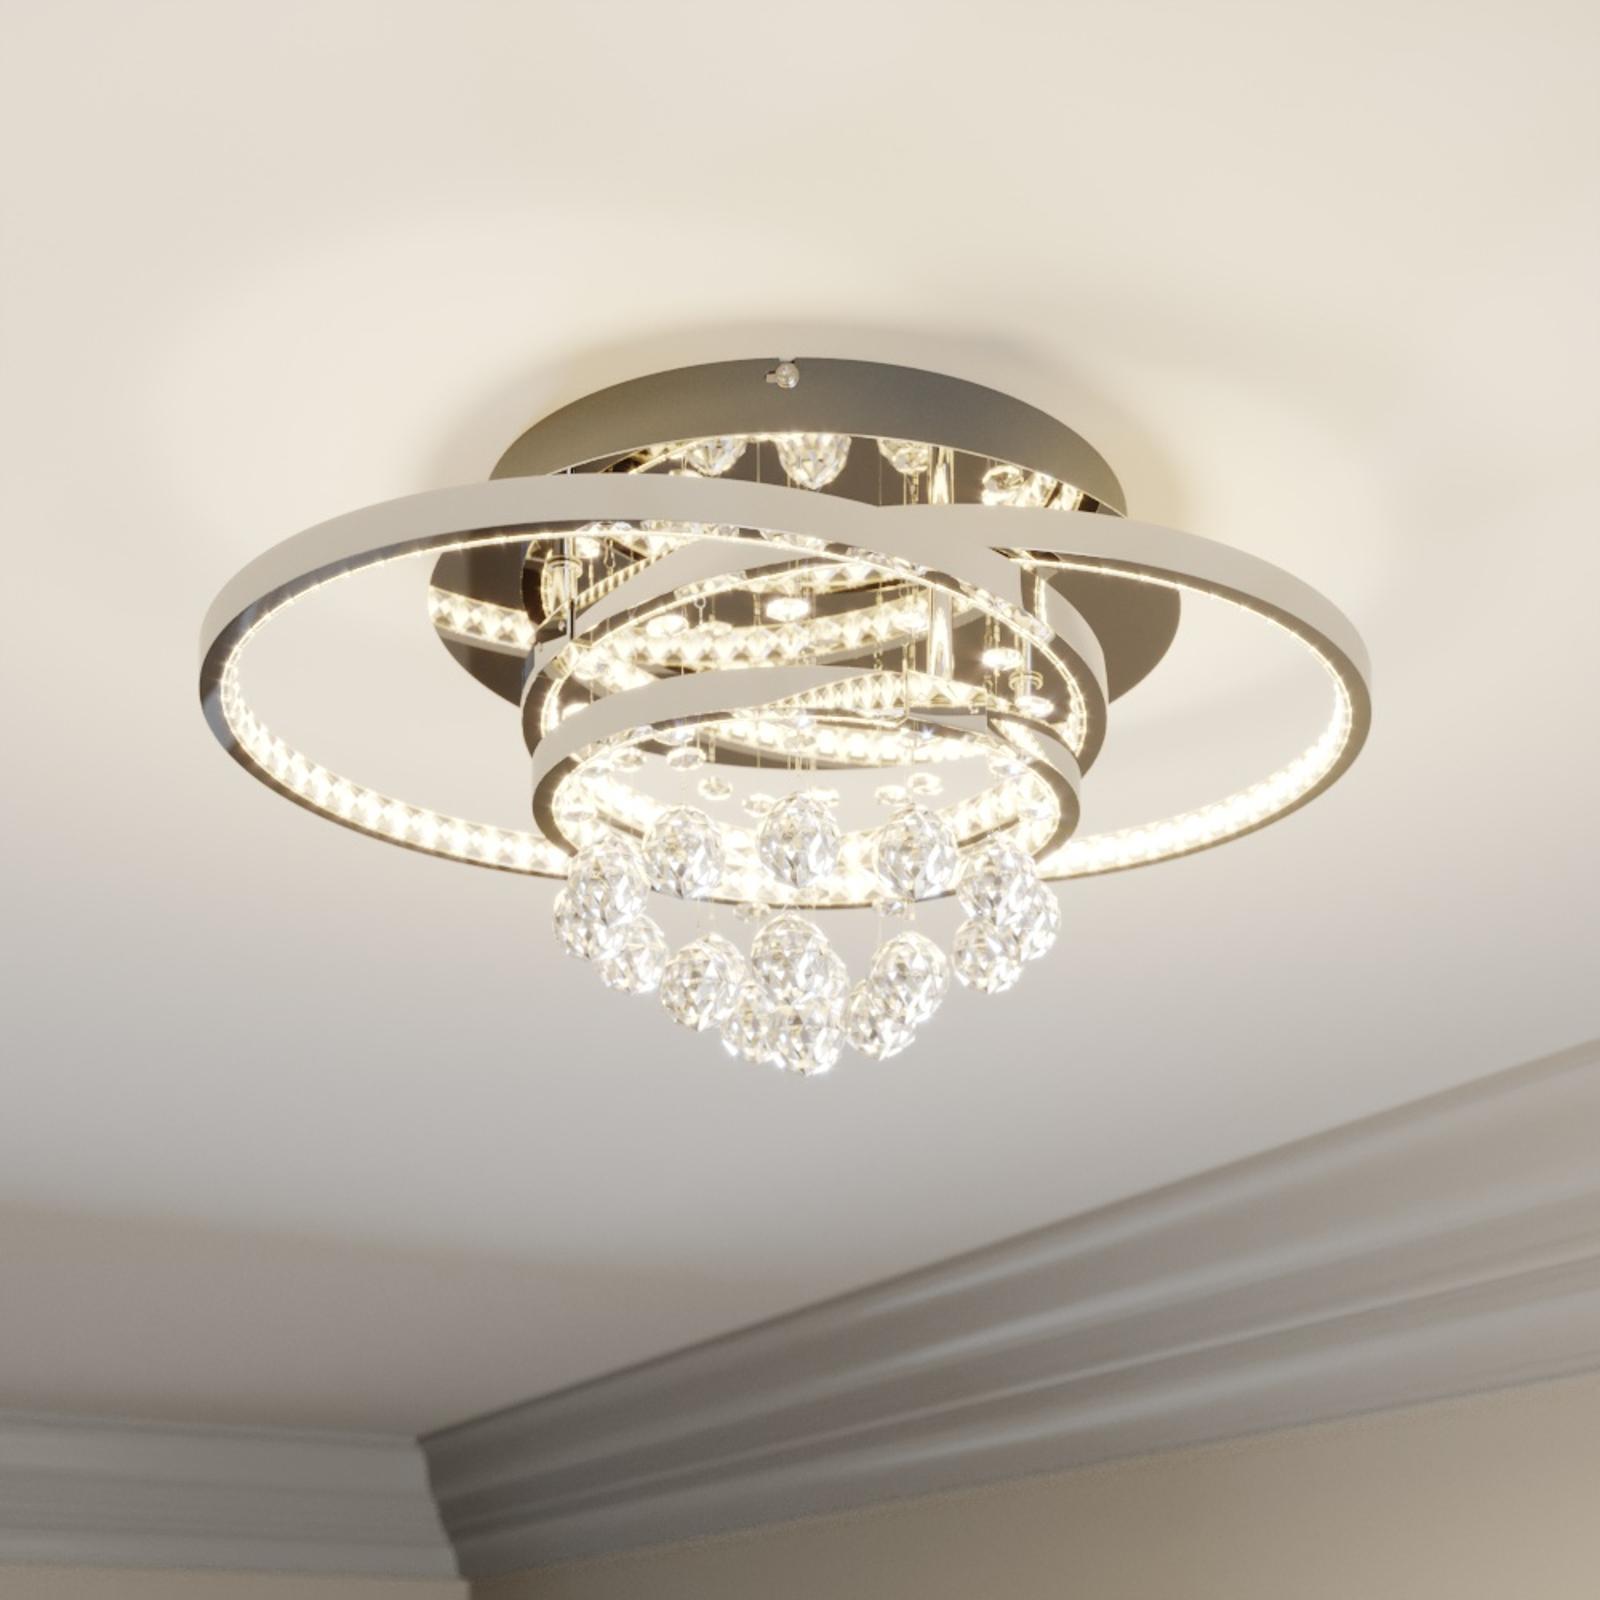 Lucande Keely LED-Deckenleuchte Kristall, 44,5 cm